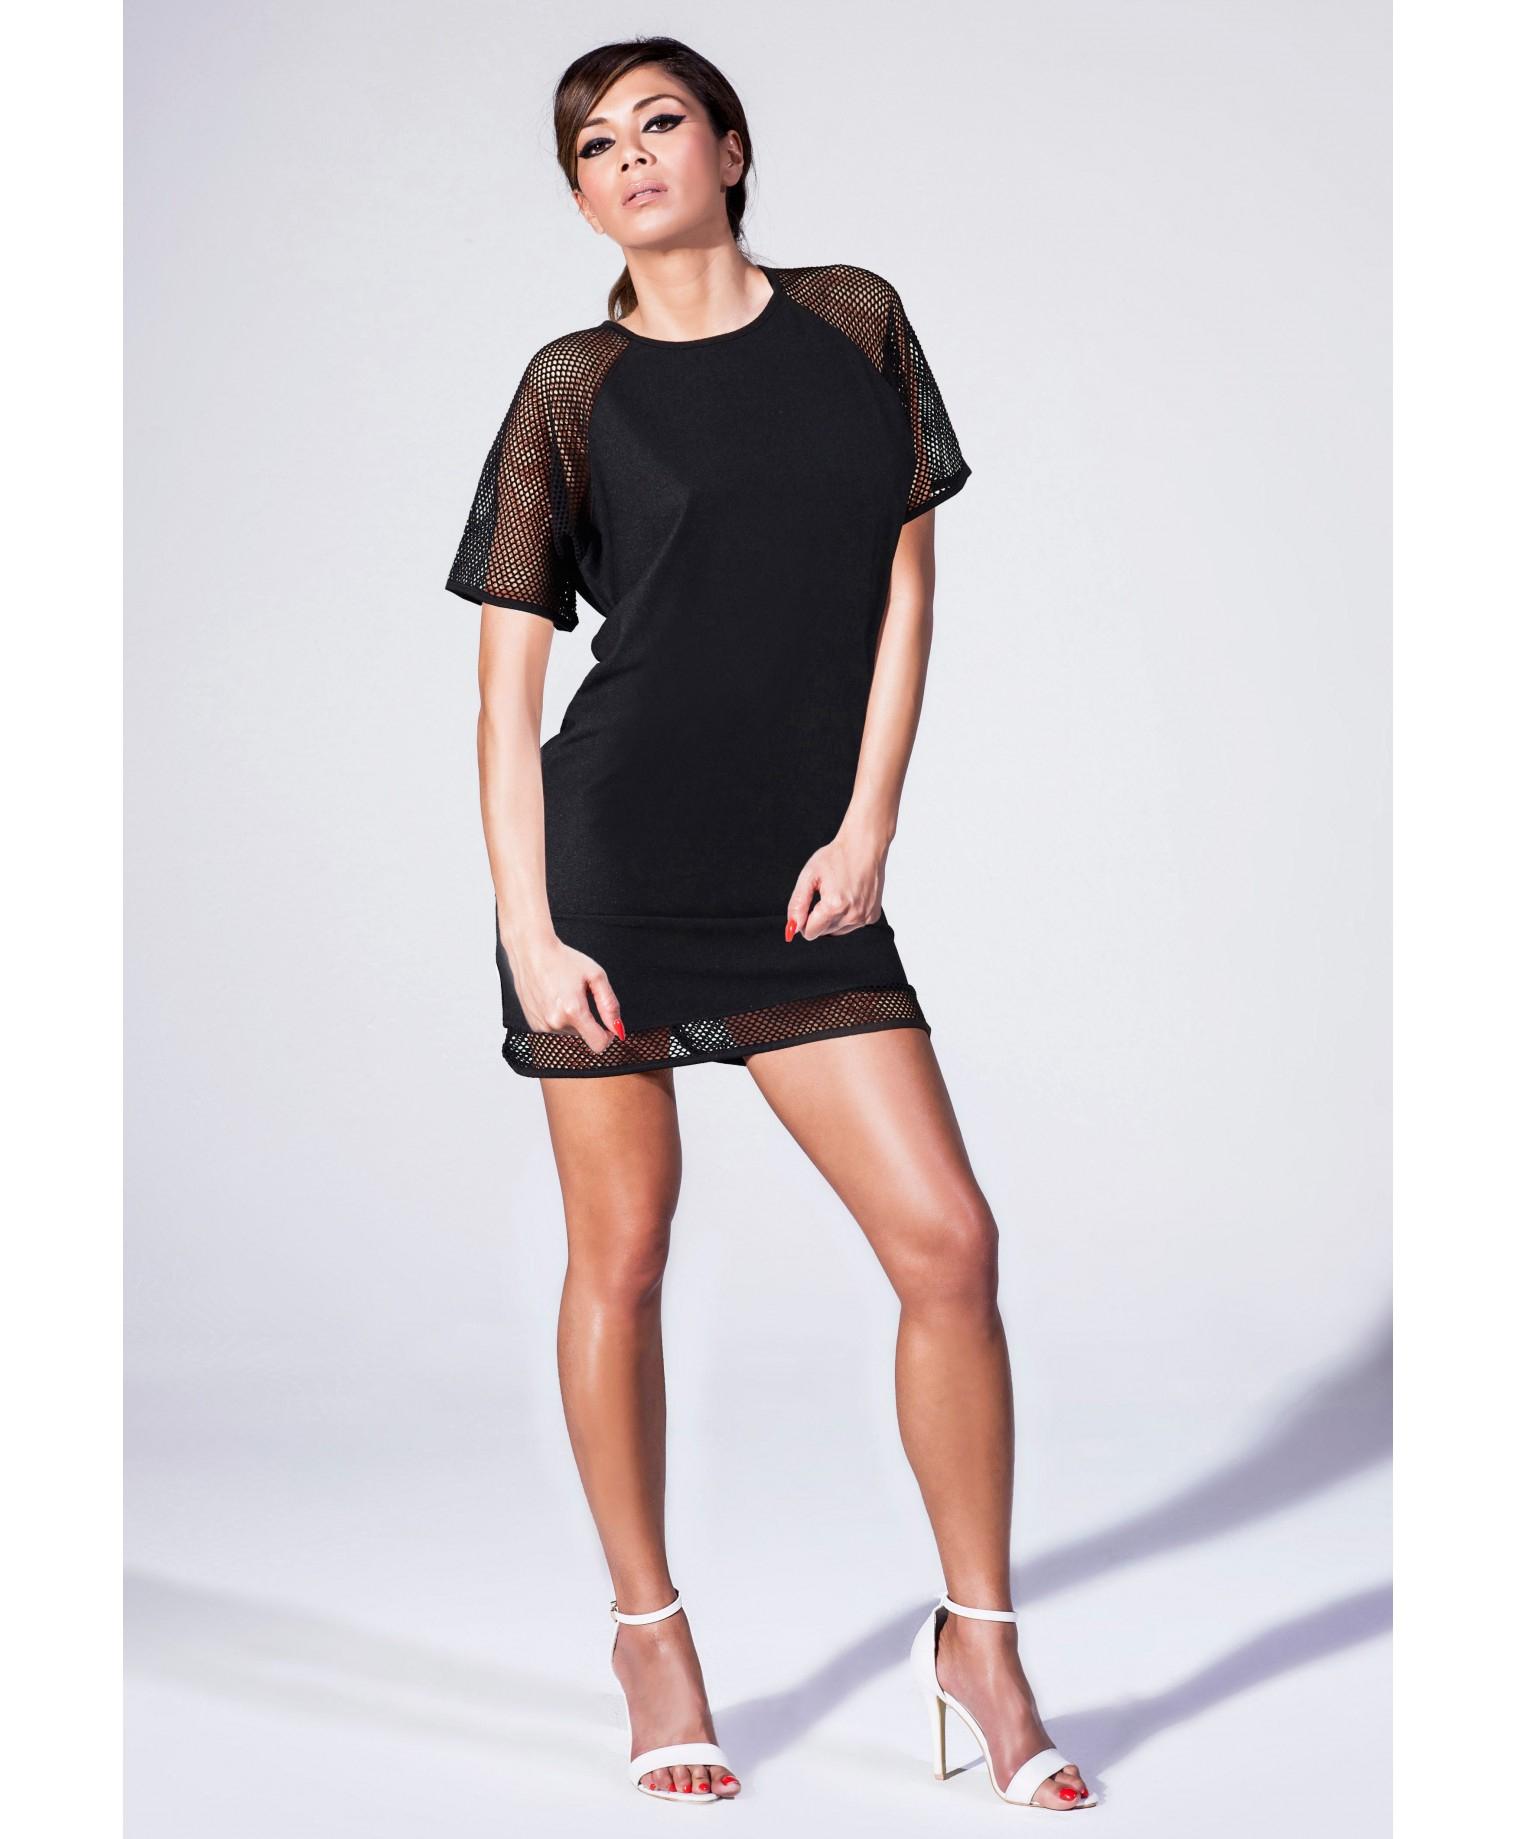 black fishnet t shirt dress